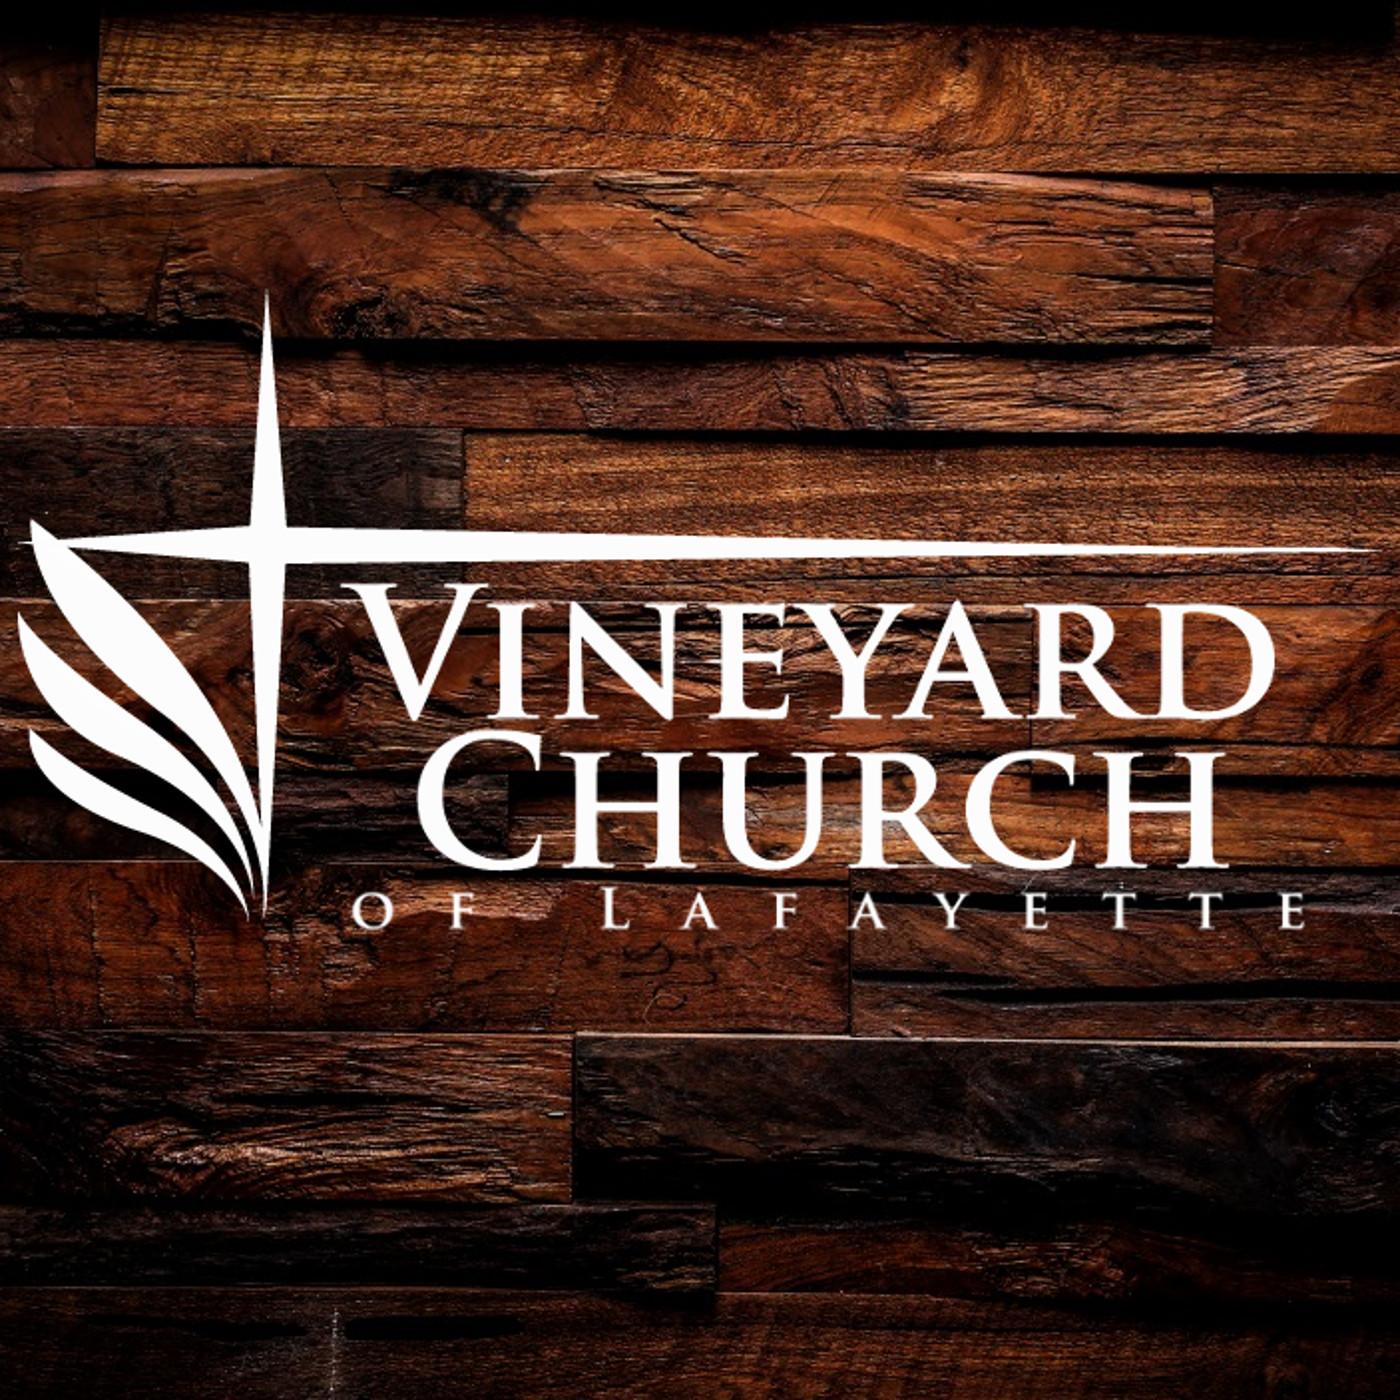 VINEYARD CHURCH OF LAFAYETTE